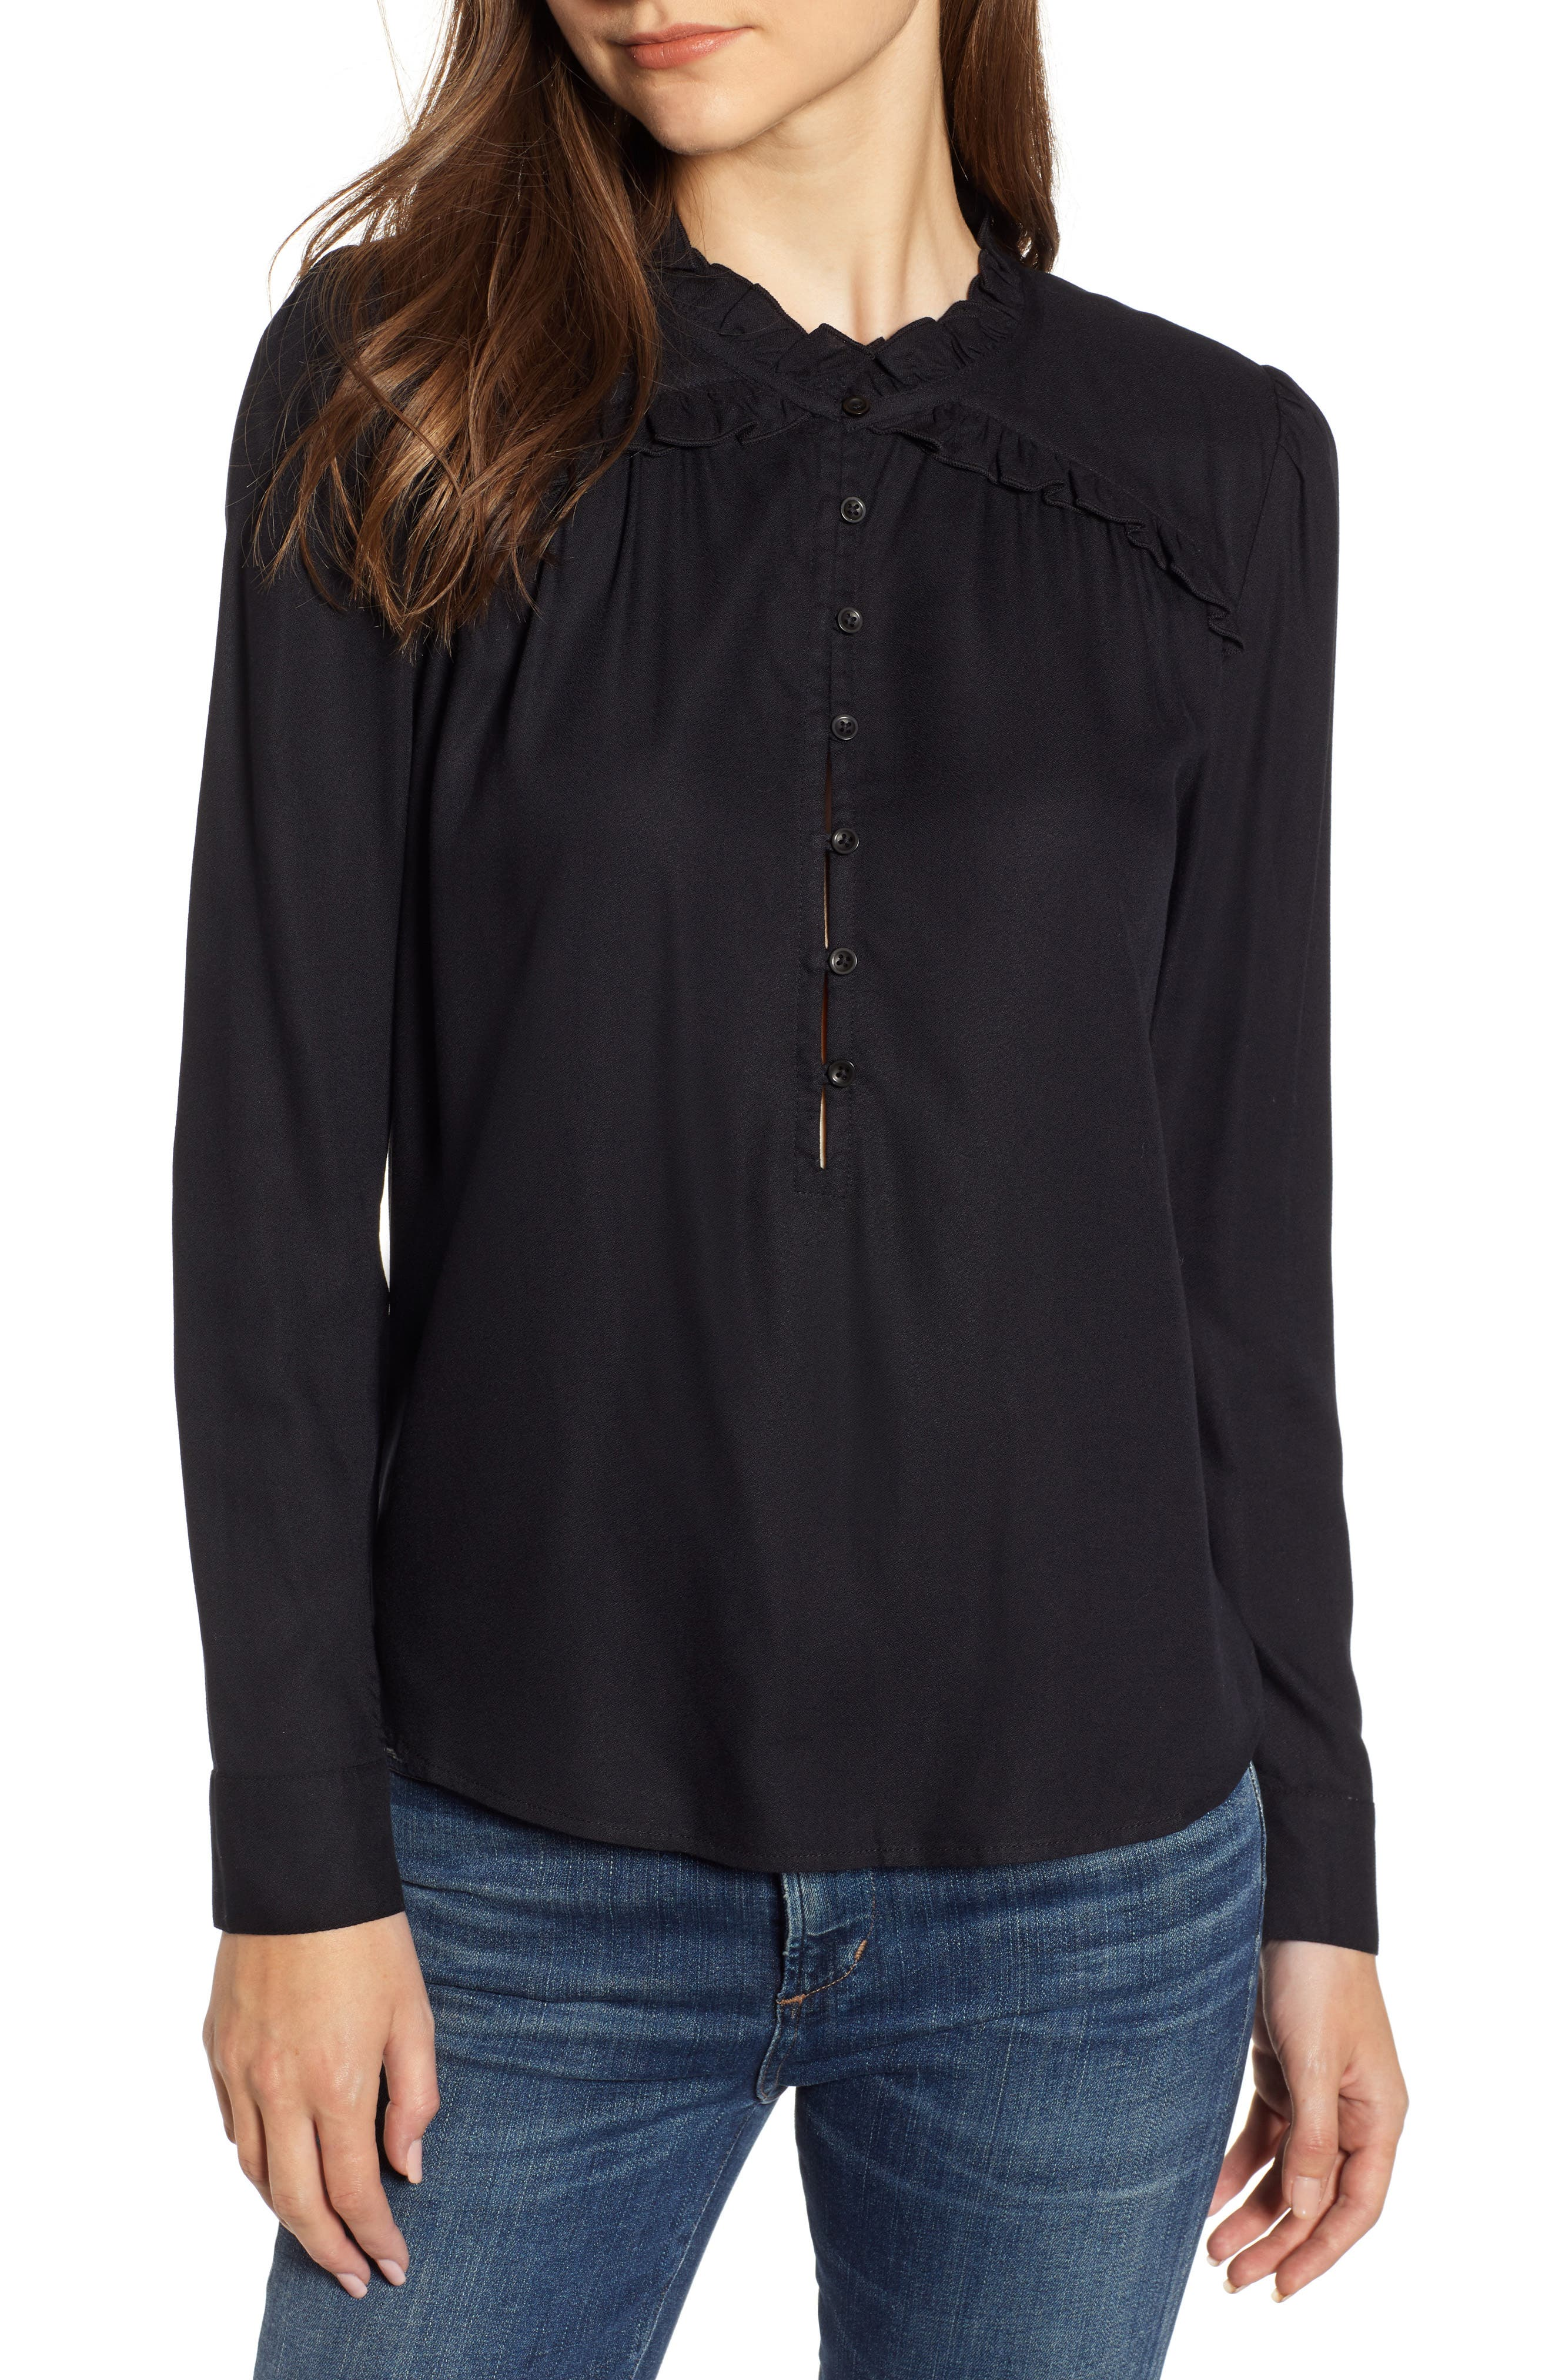 HINGE Ruffle Detail Popover Blouse, Main, color, BLACK